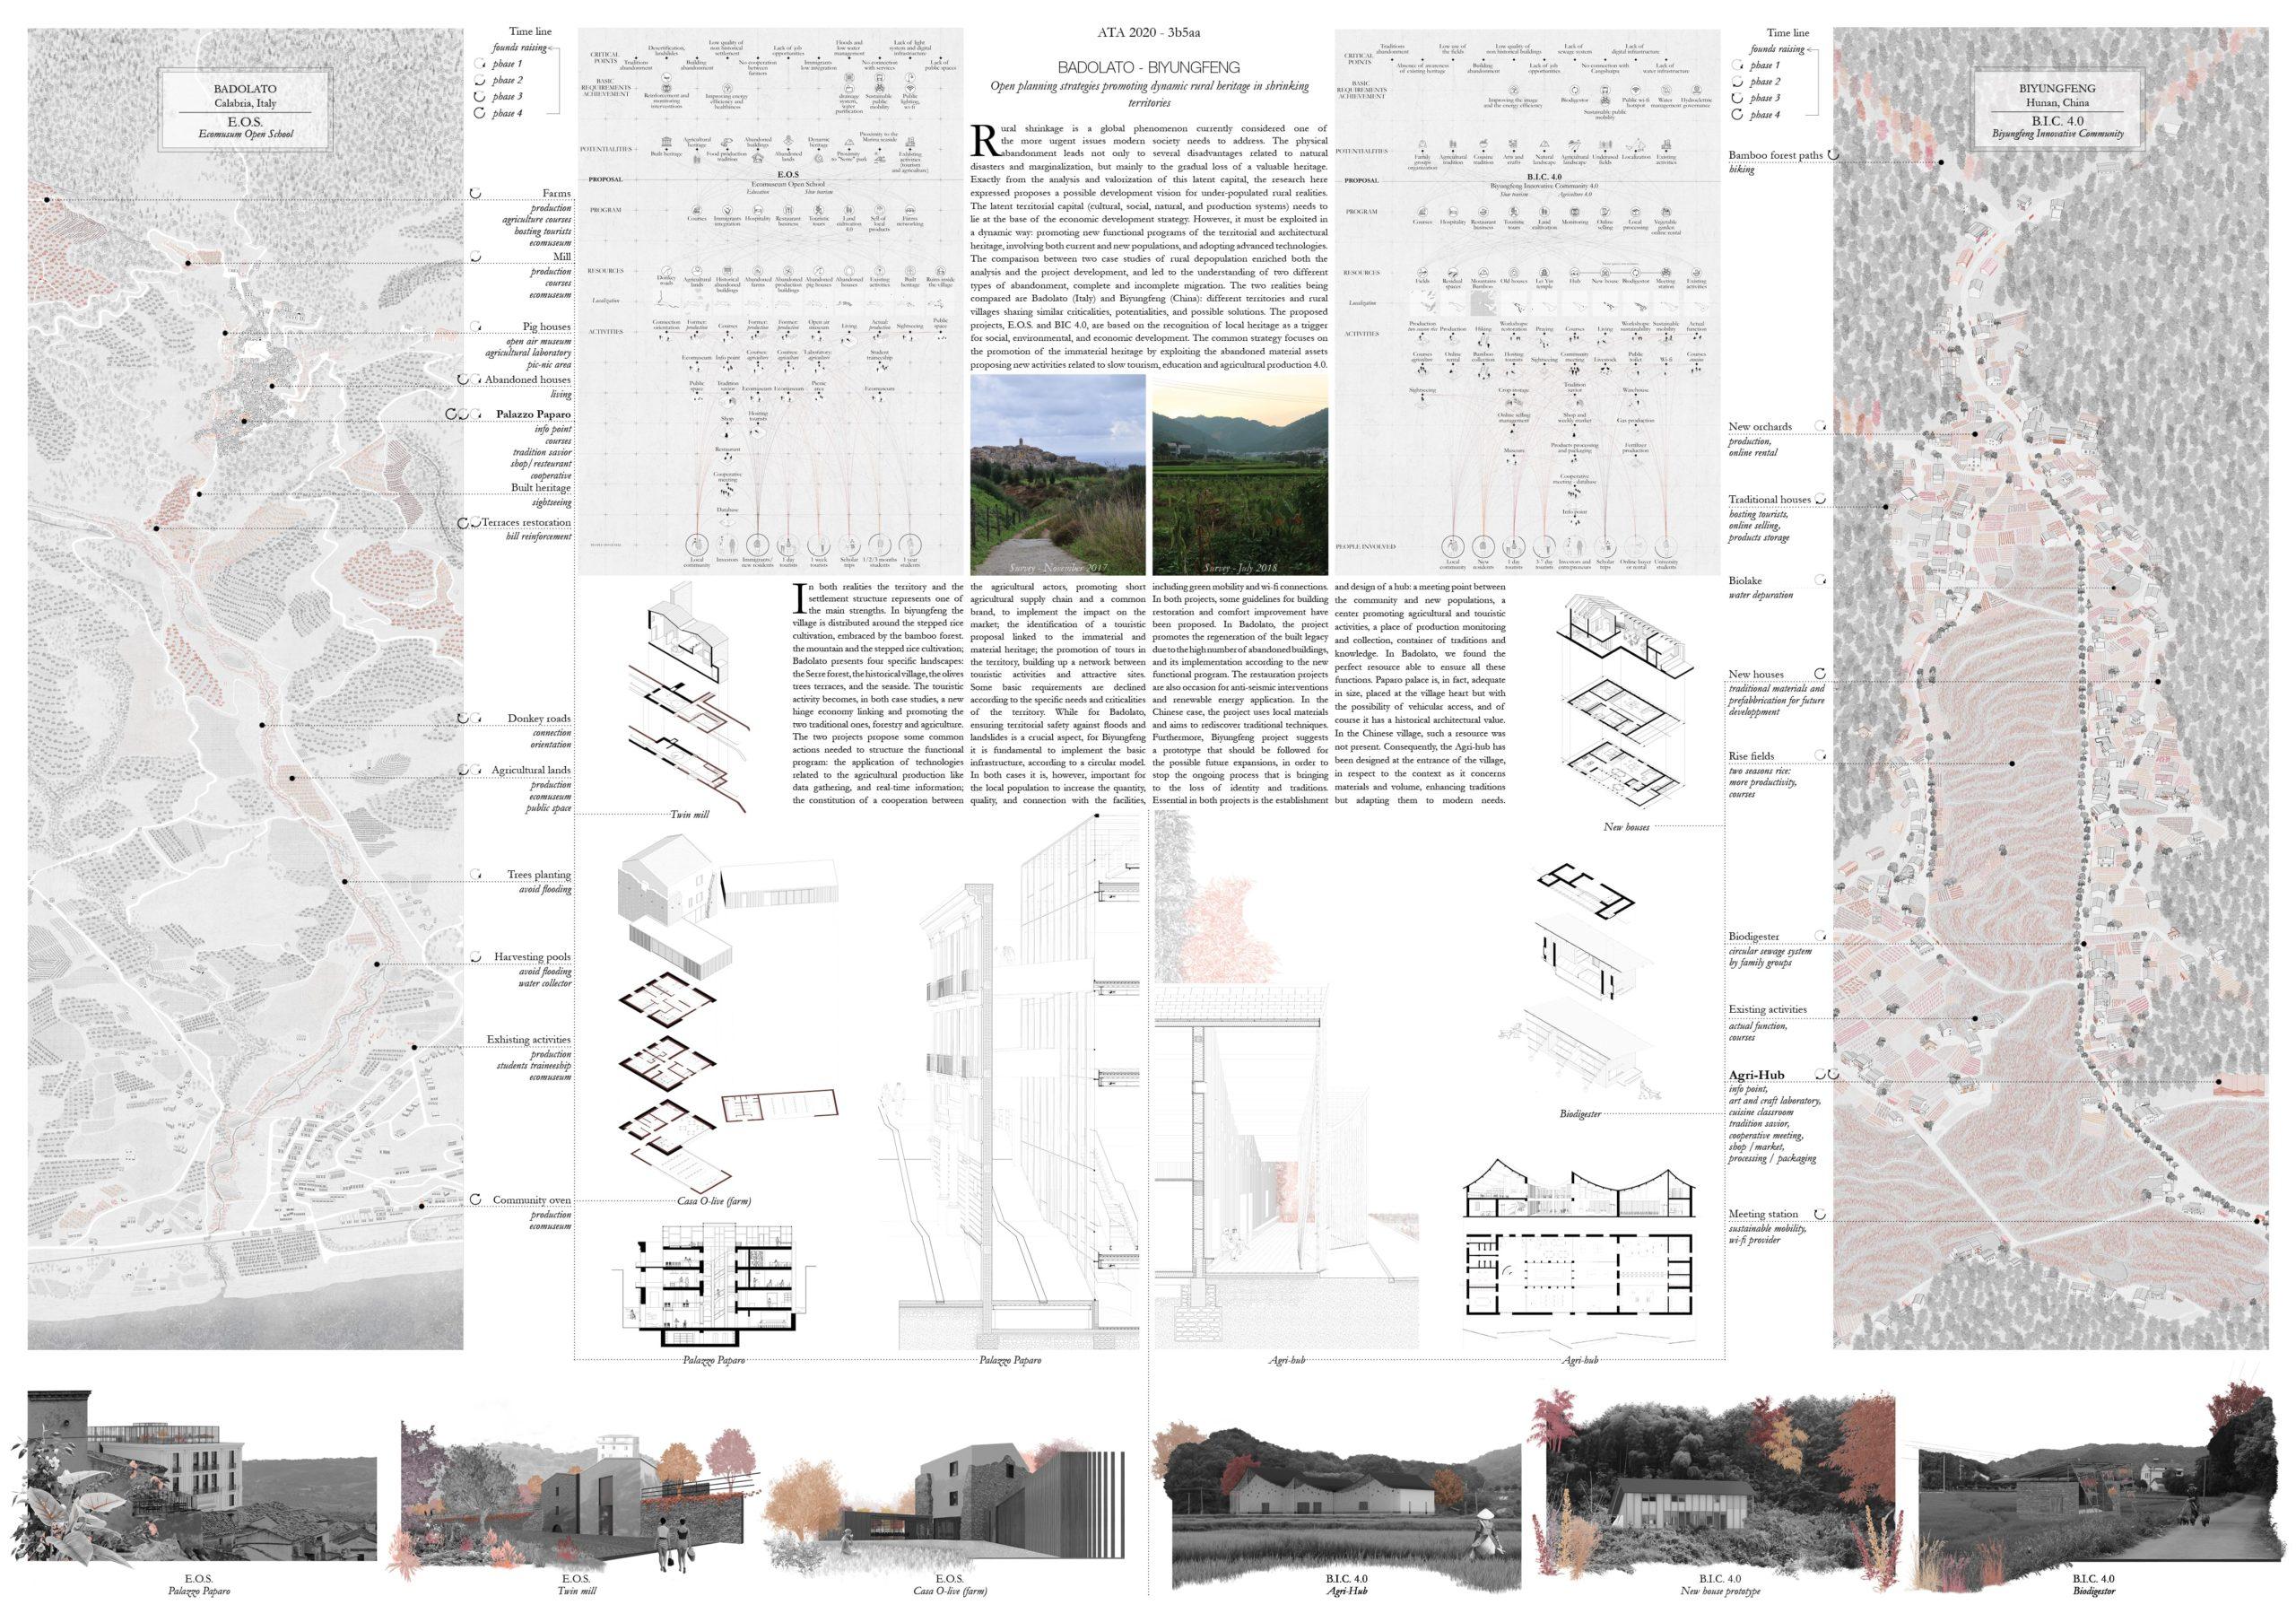 BADOLATO – BIYUNGFENG. Open planning strategies promoting dynamic rural heritage in shrinking TERRITORIES. Board